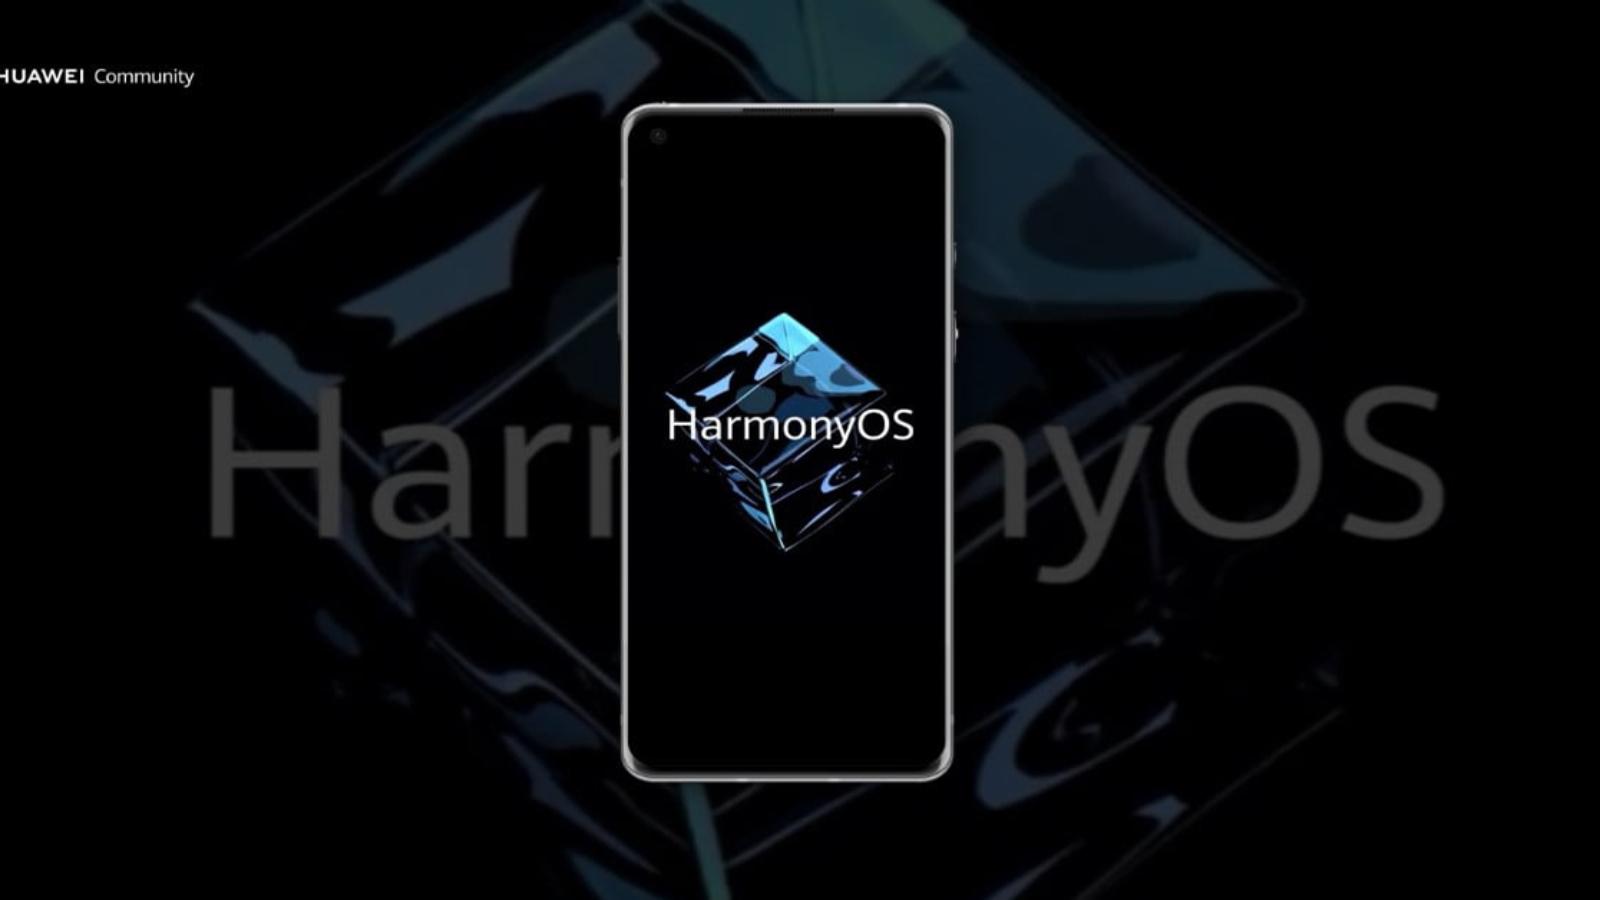 HUAWEI-P50-HARMONYOS-PORT